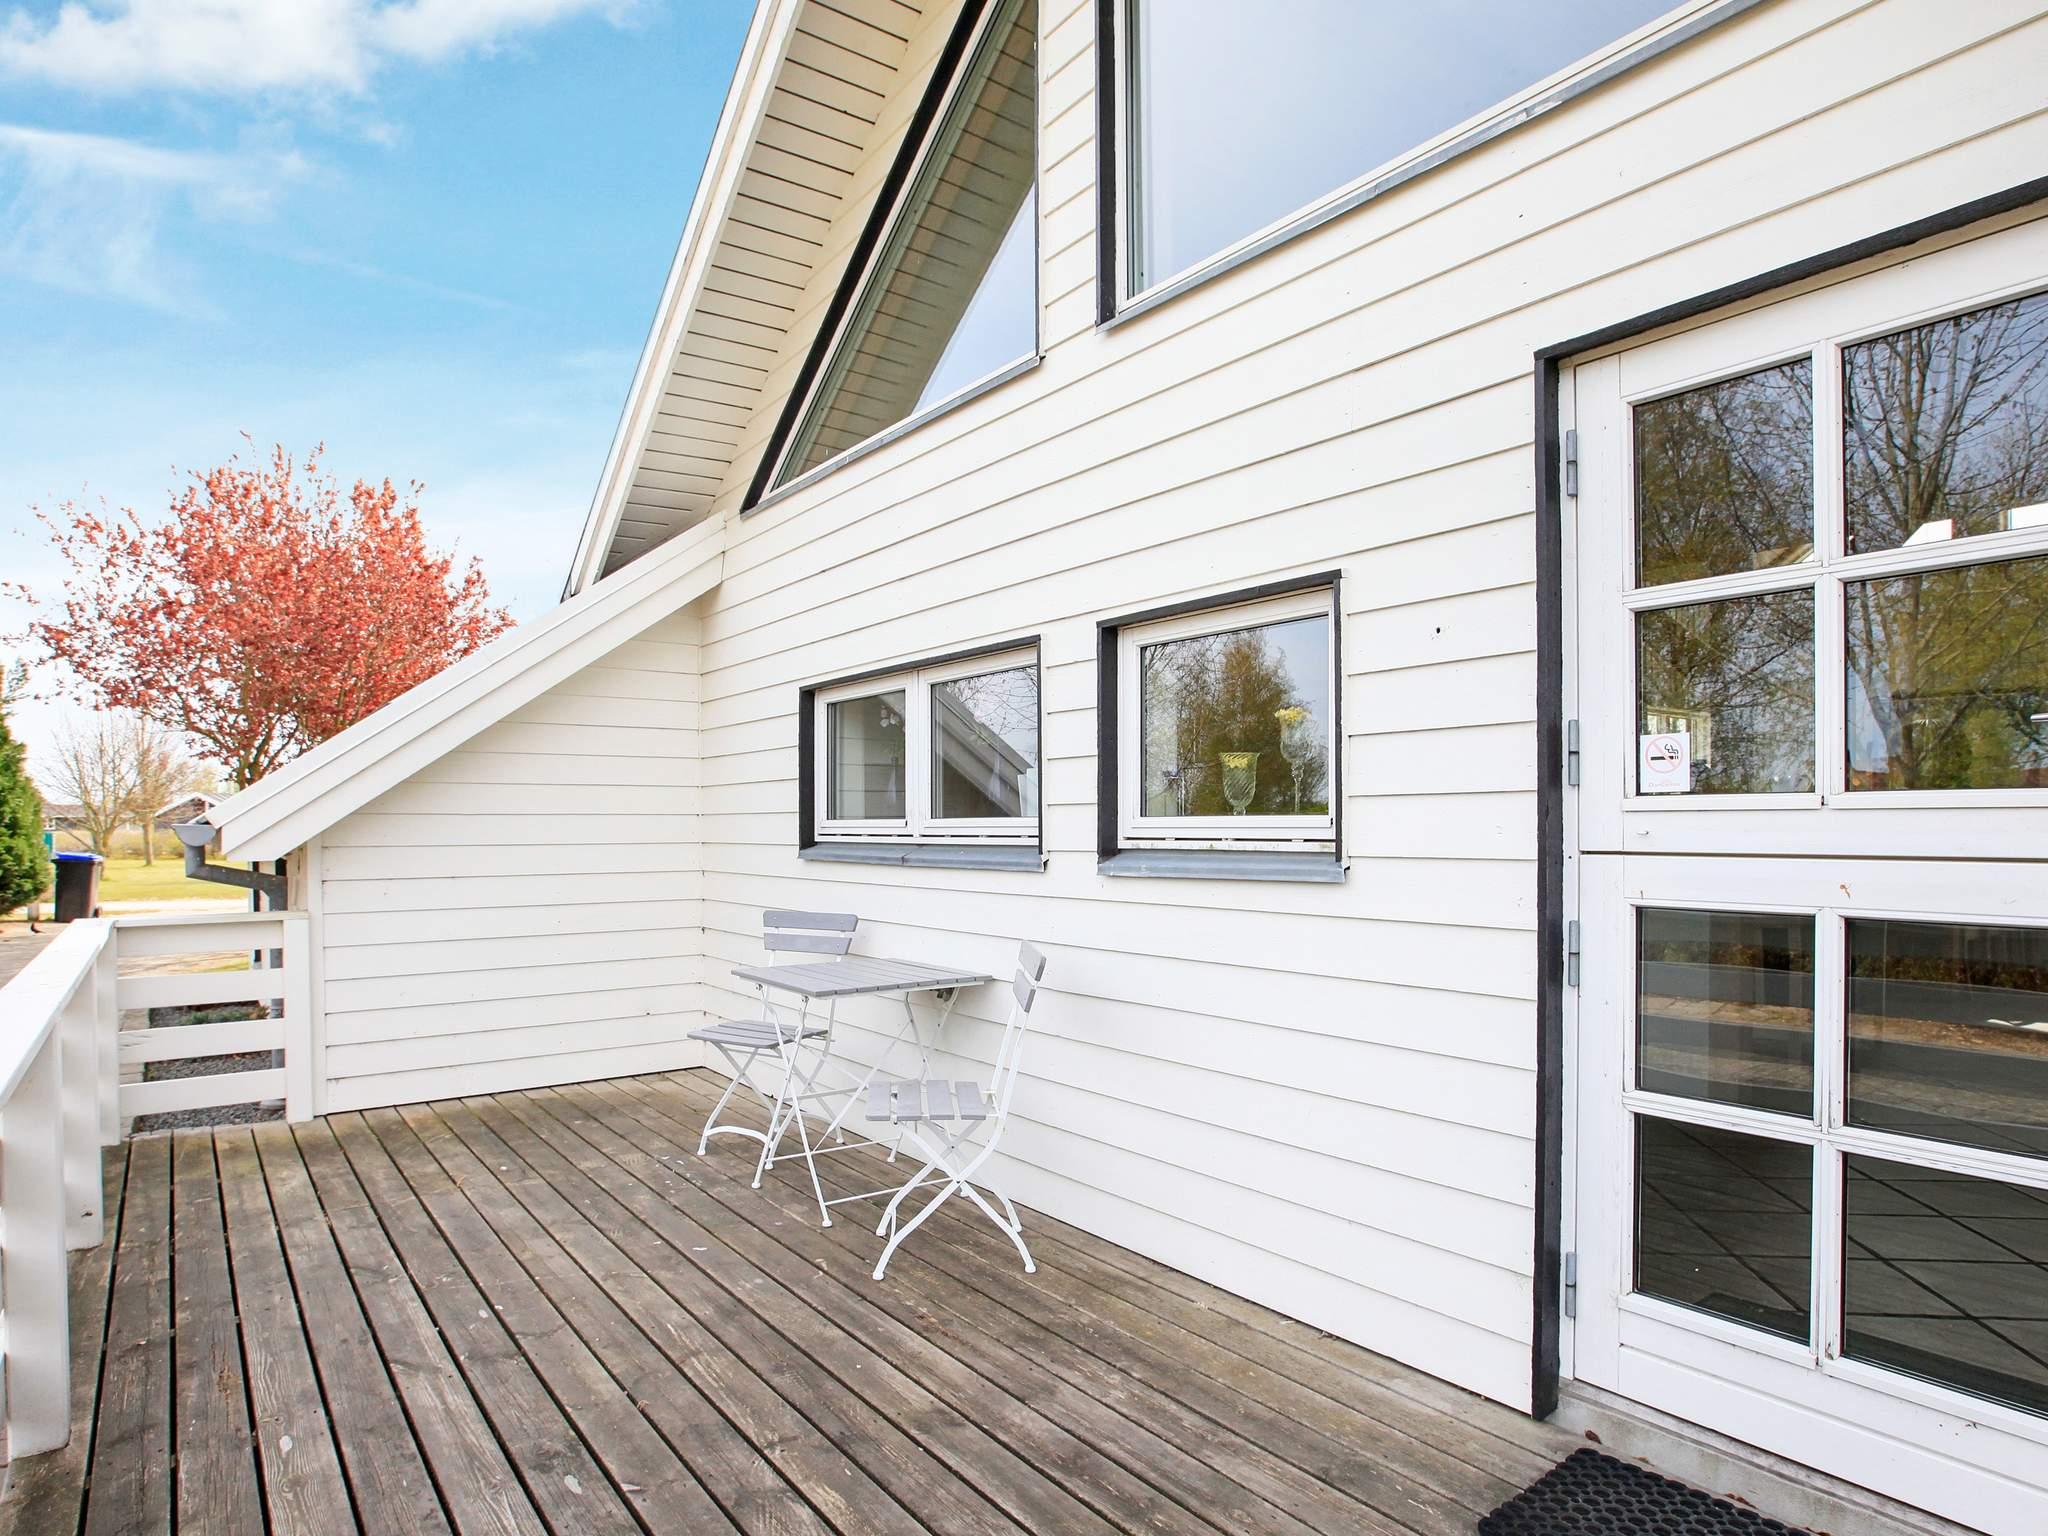 Maison de vacances Hasmark (82193), Hasmark, , Fionie, Danemark, image 22